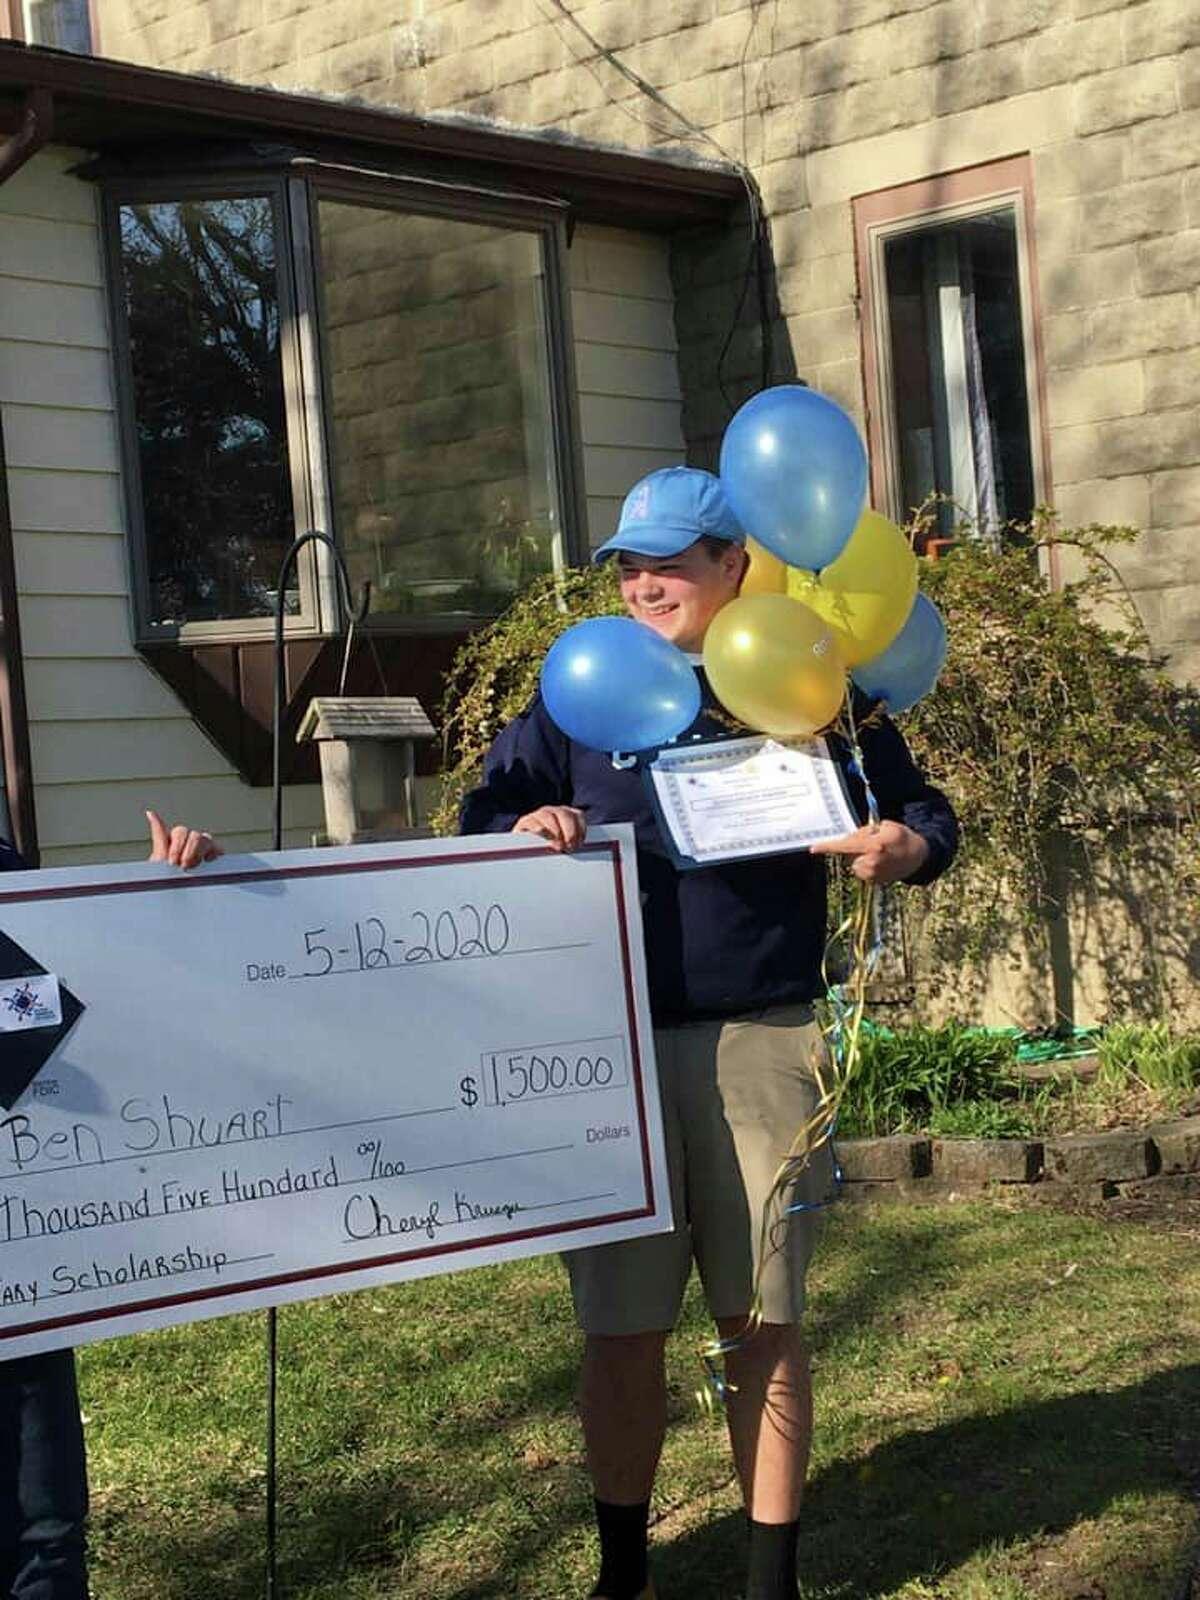 Bad Axe High School senior Ben Shuart was shocked to receive his $1,500 scholarship right outside his home. (Mackenzie Price Sundblad/Courtesy Photo)